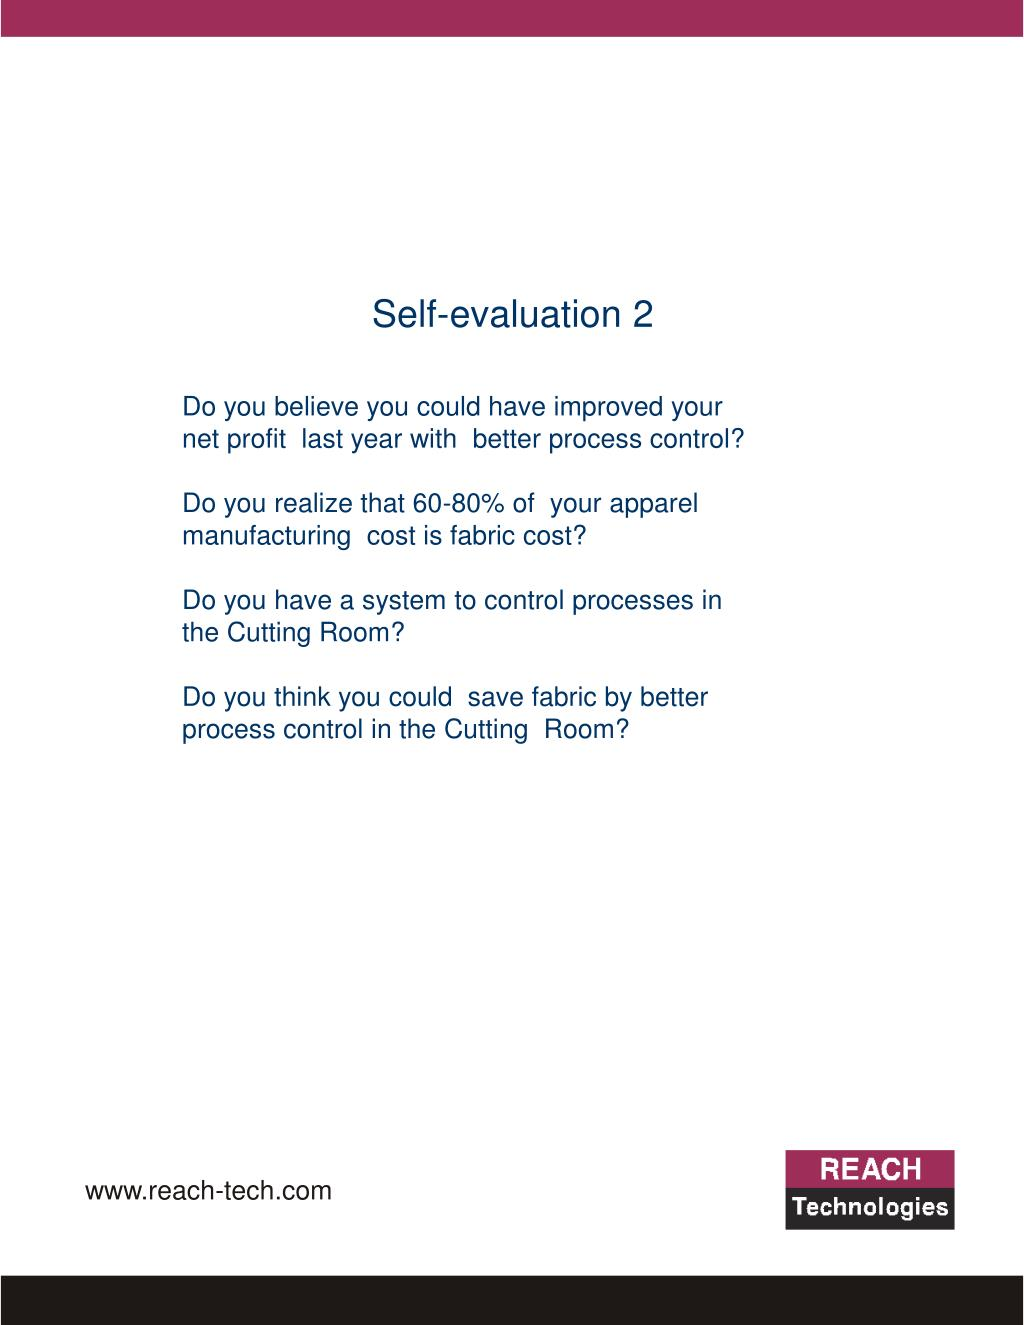 Self-evaluation 2